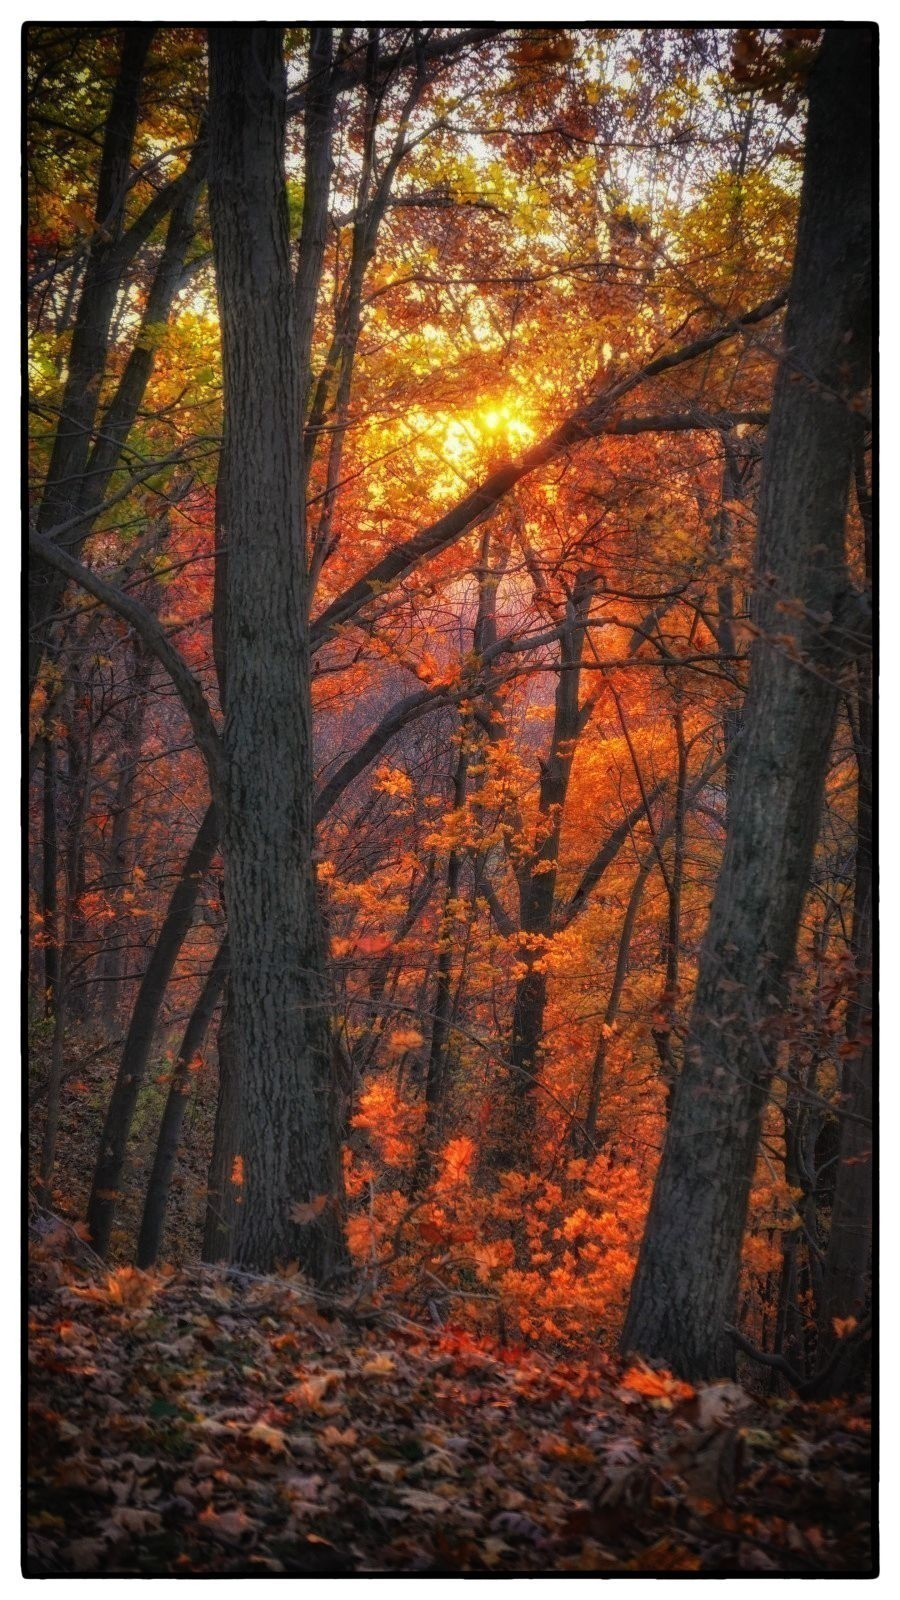 LX100 Oakwood luminous leaves sunset 031.JPG